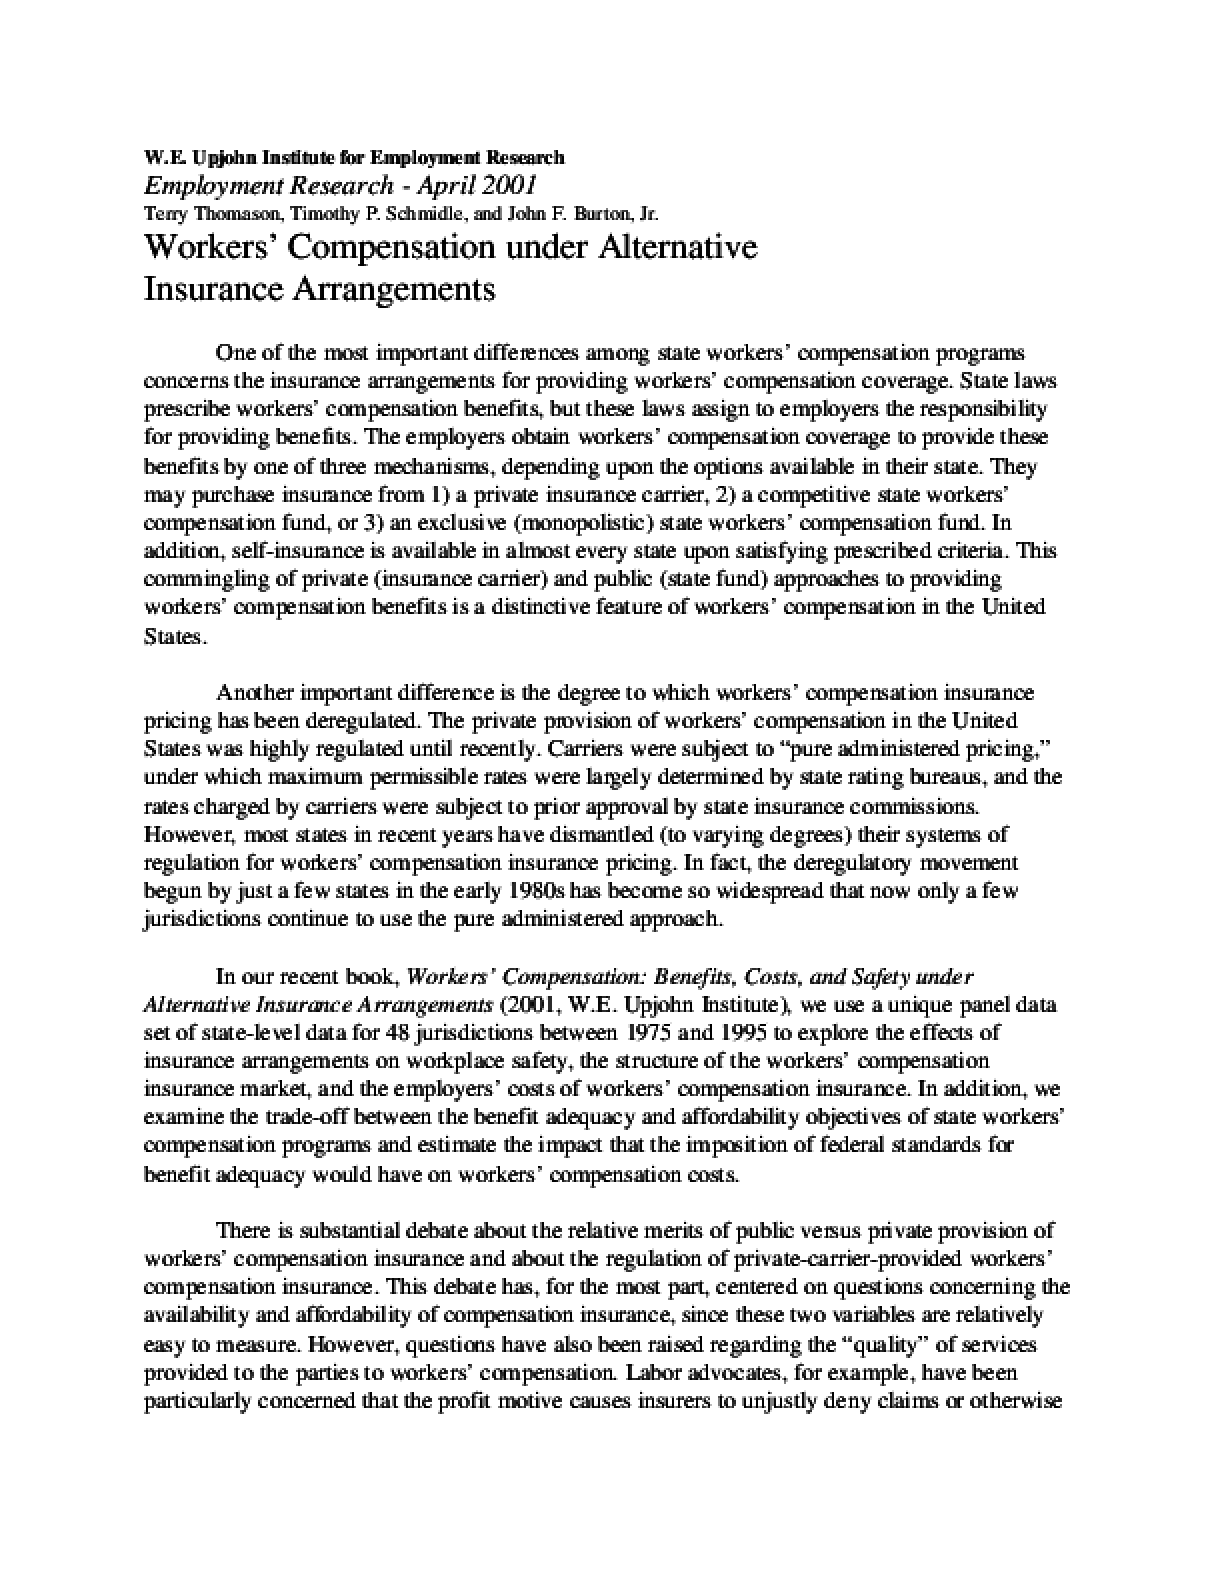 Workers' Compensation Under Alternative Insurance Arrangements